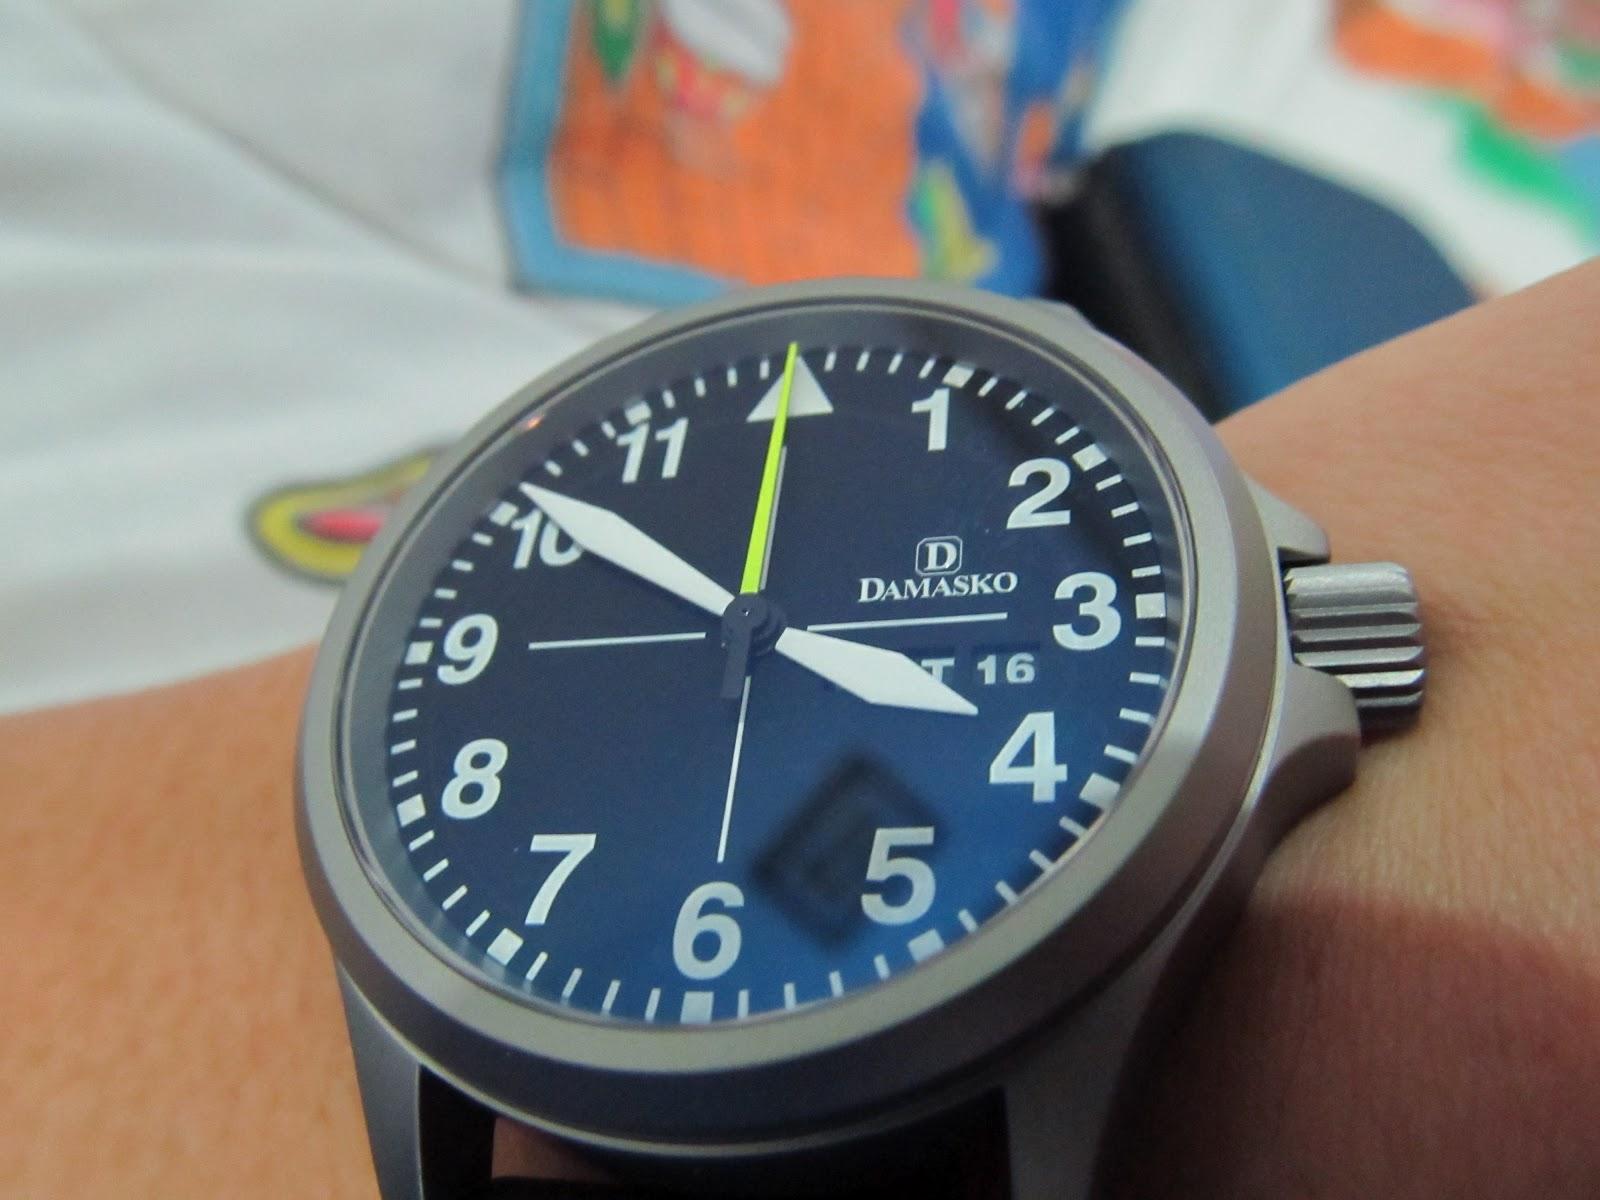 Waktu watches damasko da36 for Damasko watches